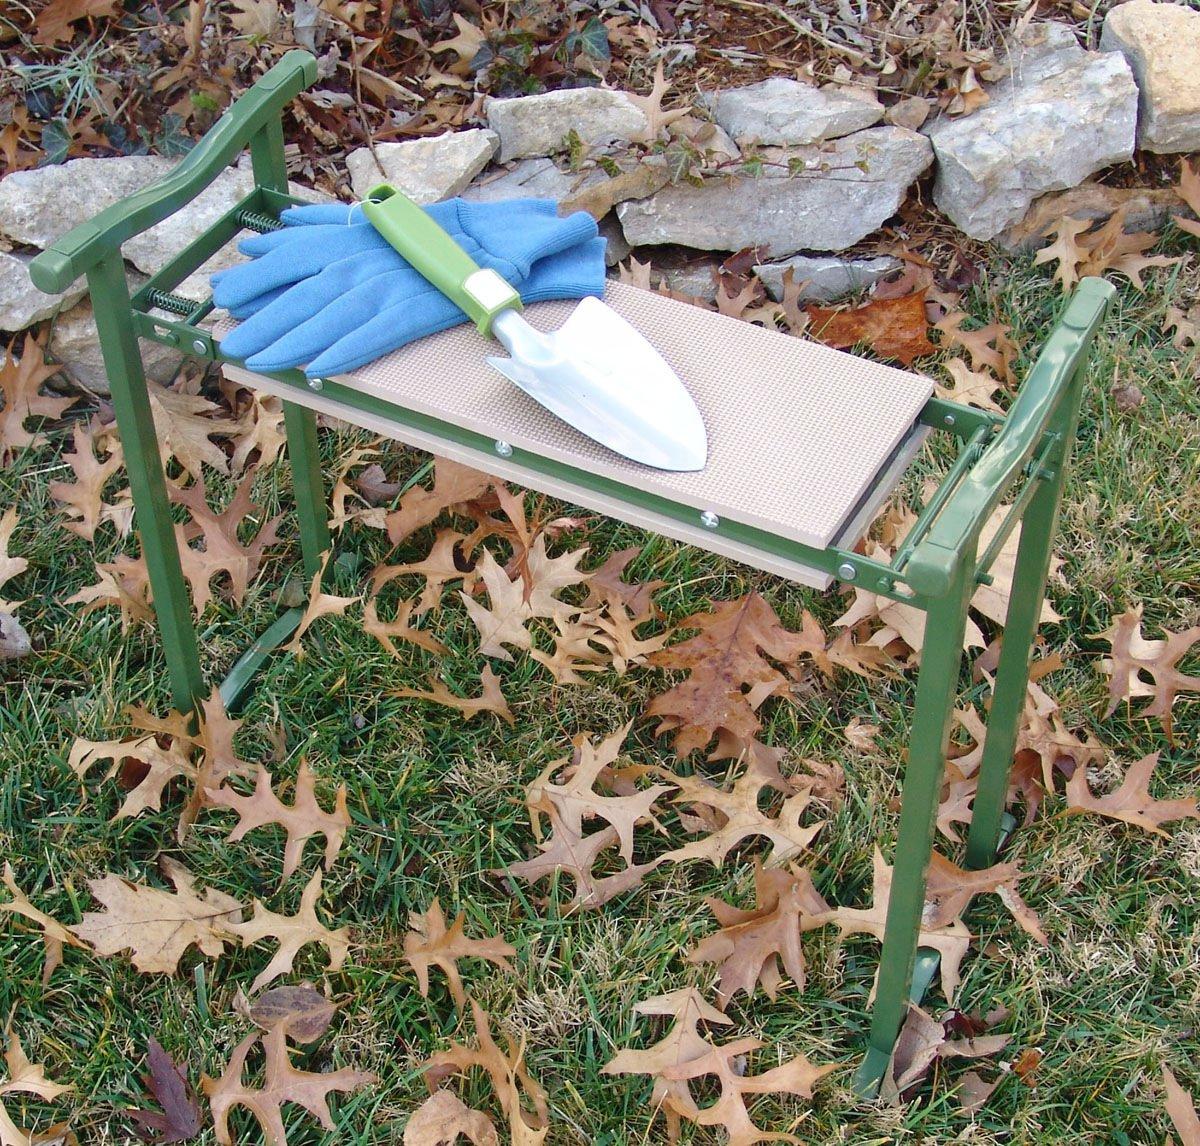 Amazon.com : Portable Multiuse Folding Garden Kneeling Bench And Seat,  WA153 : Garden Kneeling Cushions : Garden U0026 Outdoor